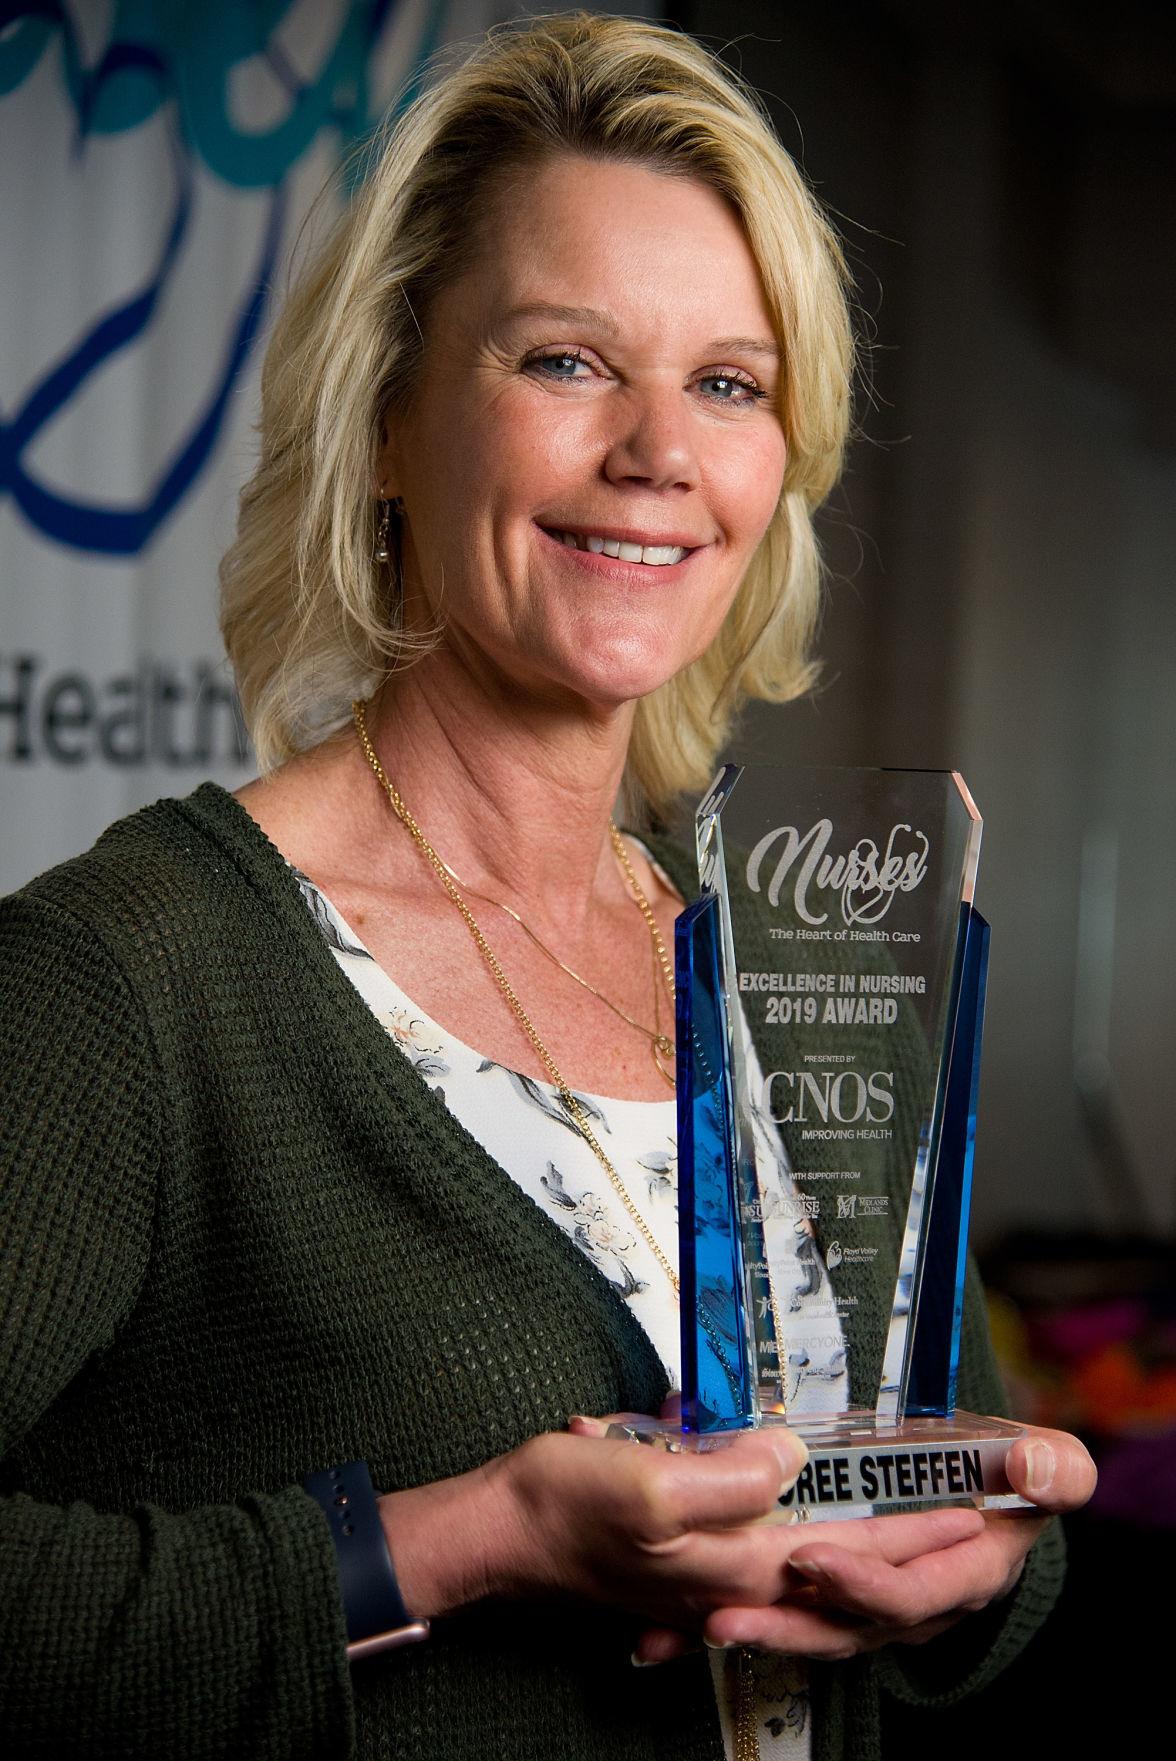 Celebrating Nurses Awards Event